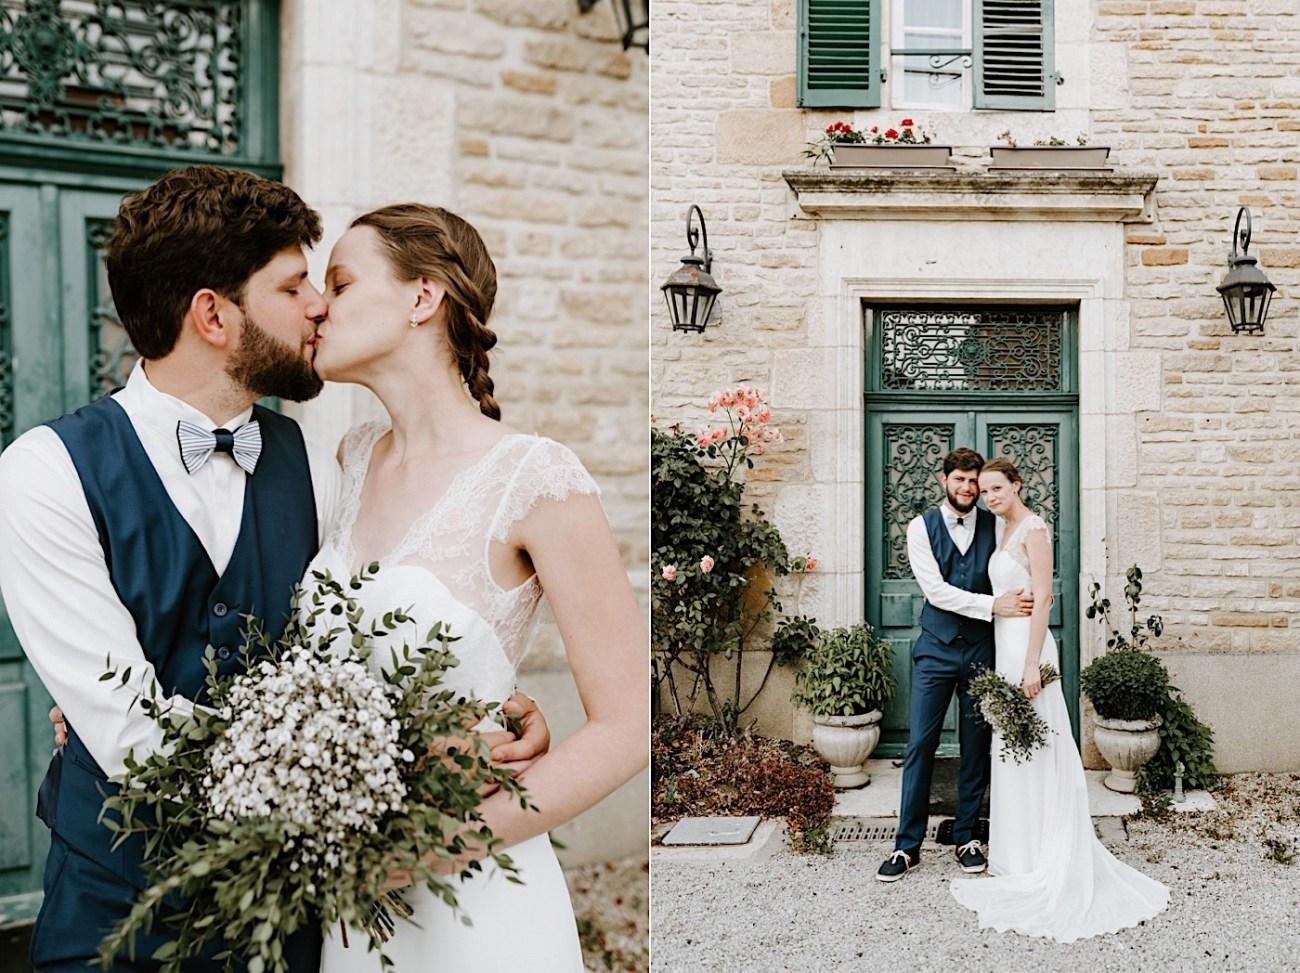 French Rural Wedding After Wedding Day Photos Paris Wedding Photographer 003